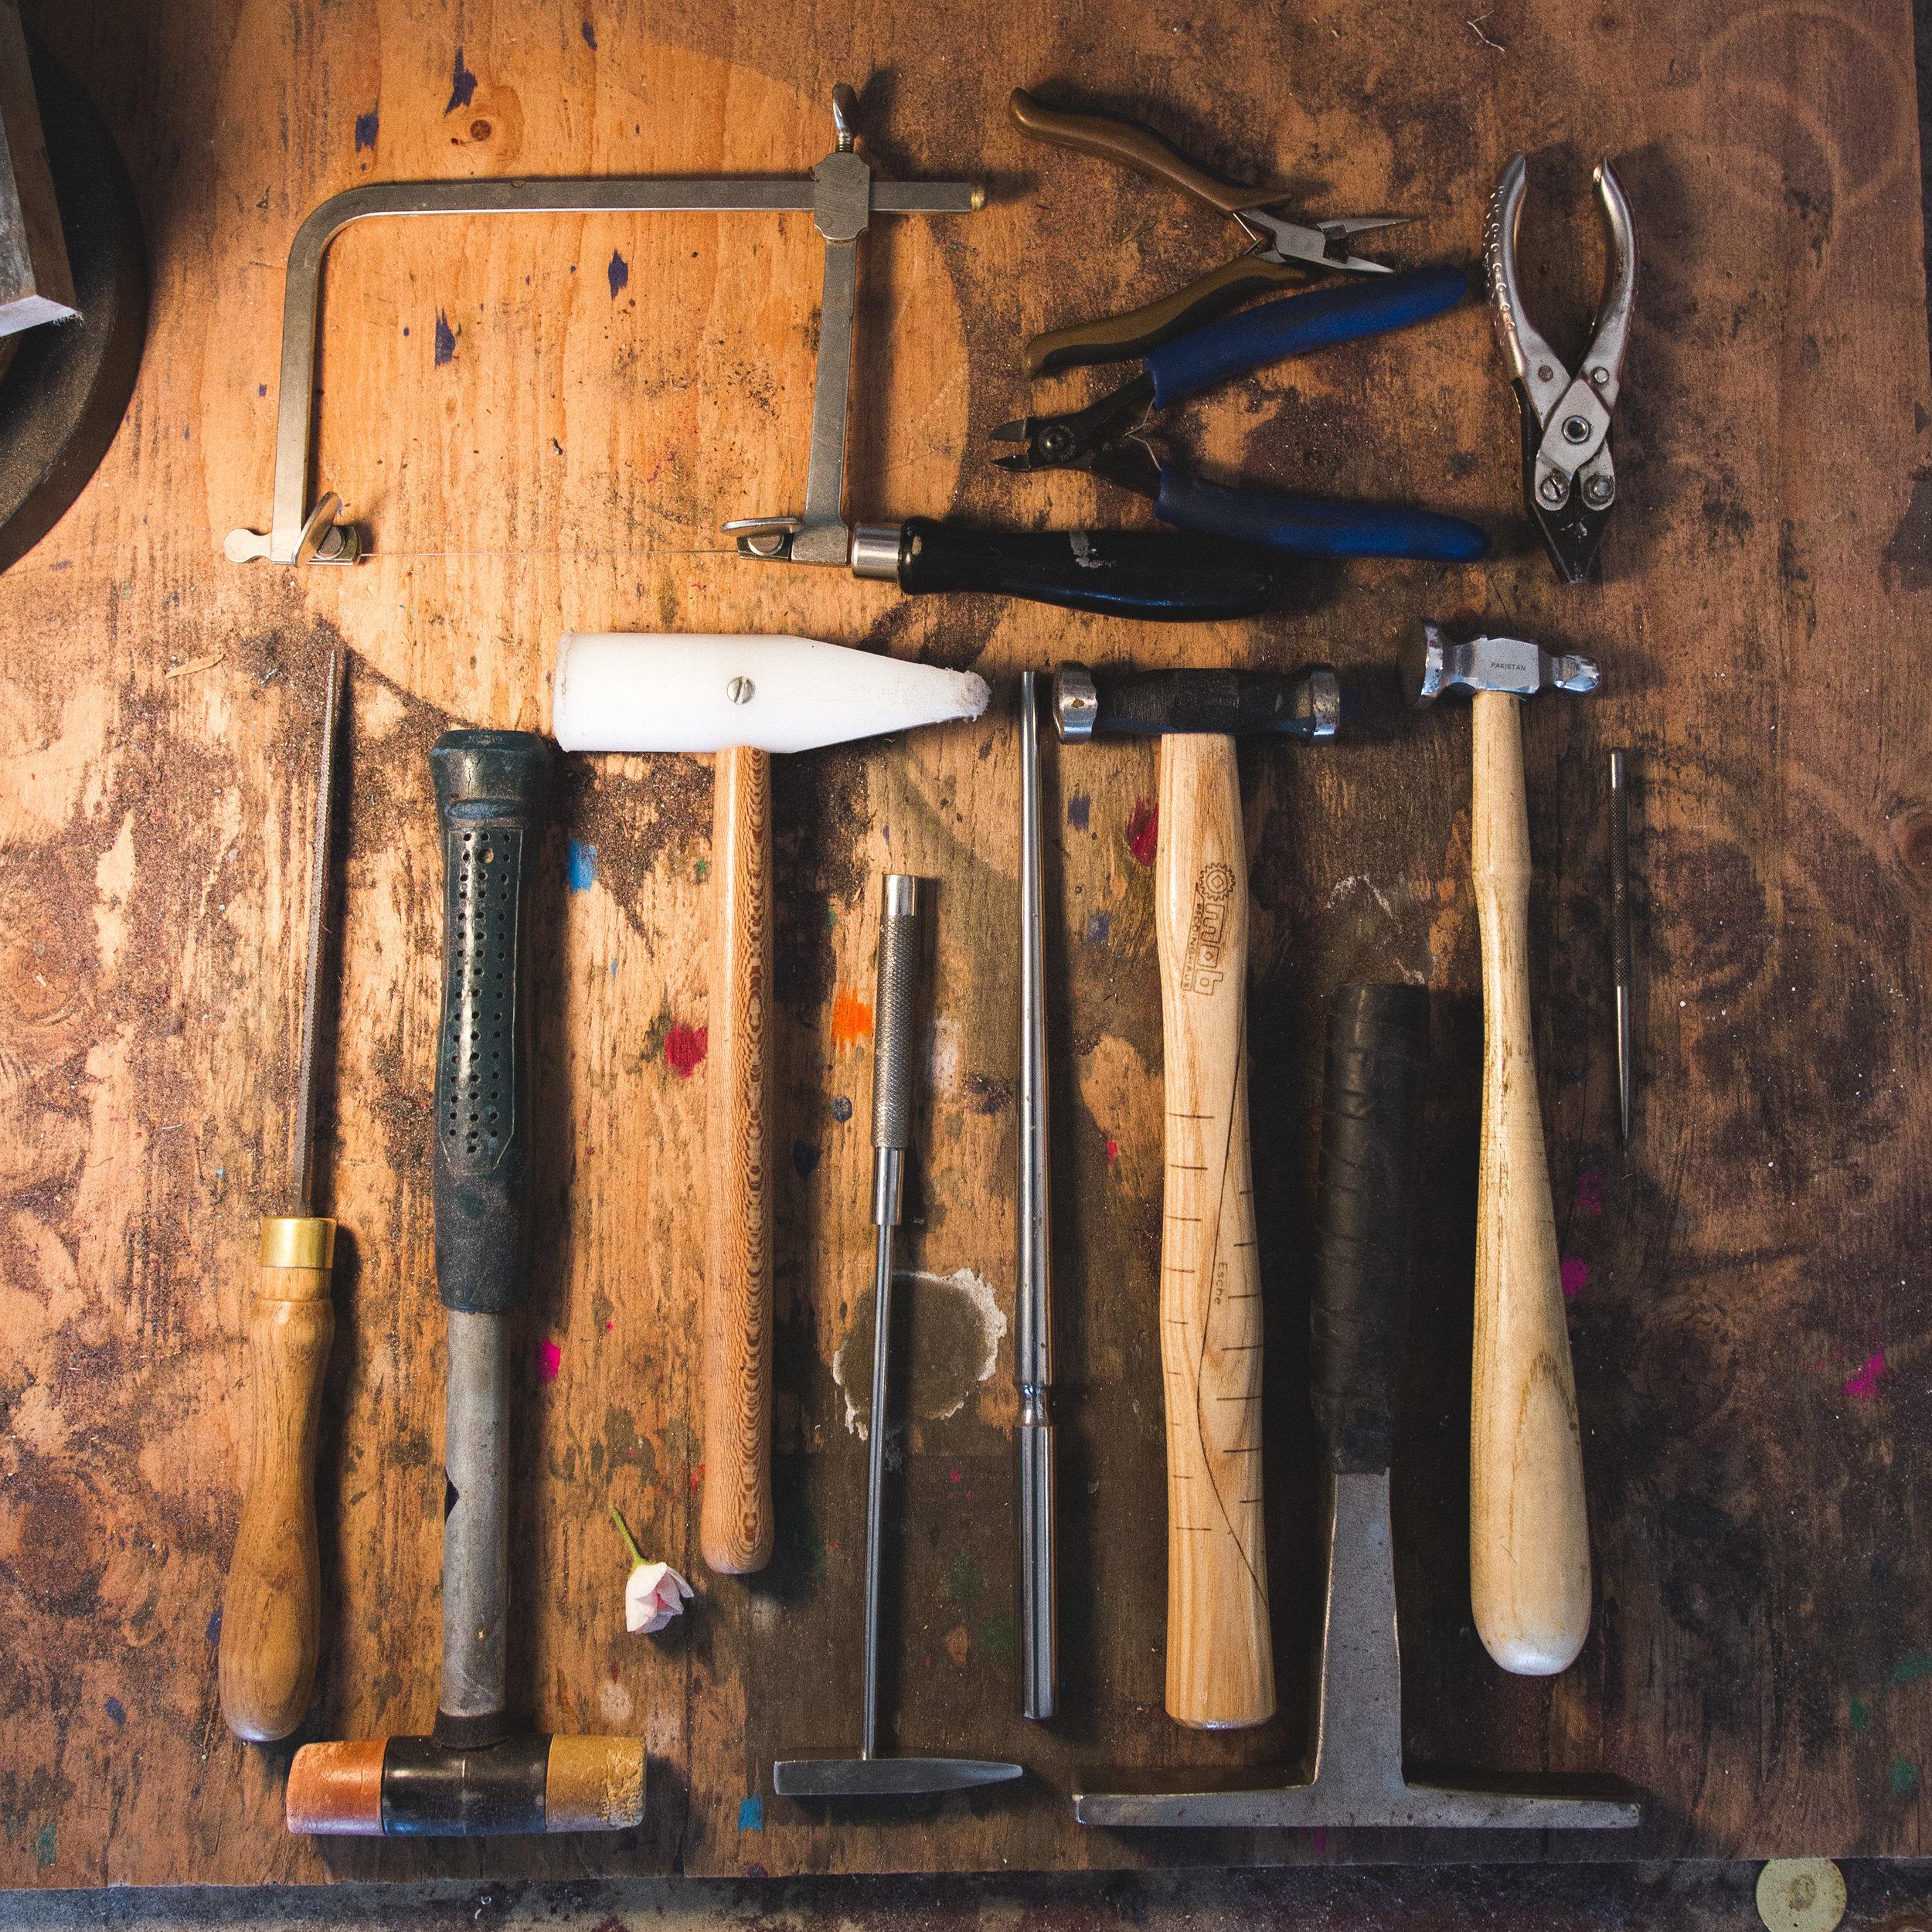 My trusty tools.